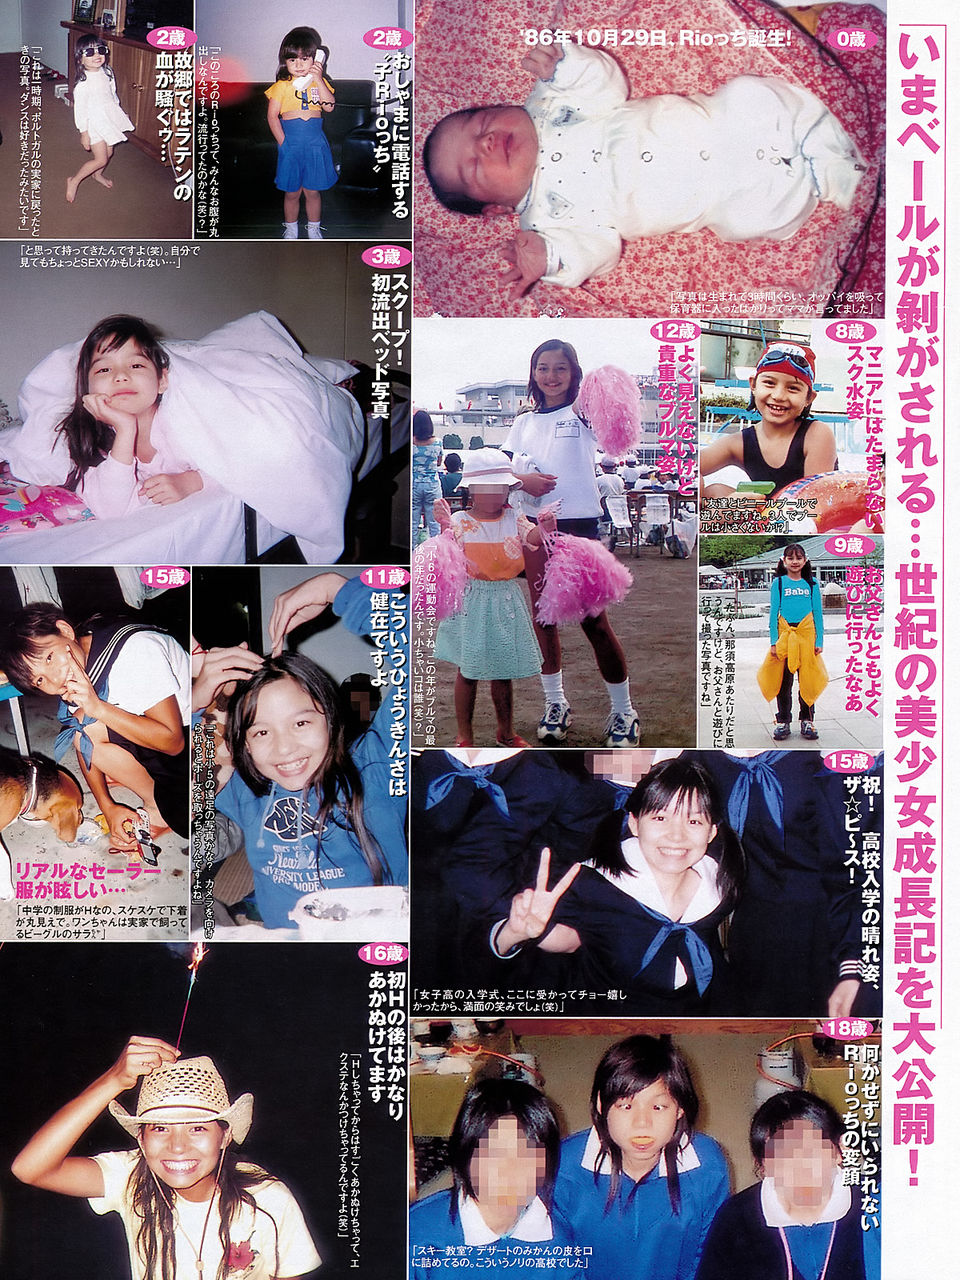 https://livedoor.blogimg.jp/negigasuki/imgs/5/9/59baaa53.jpg